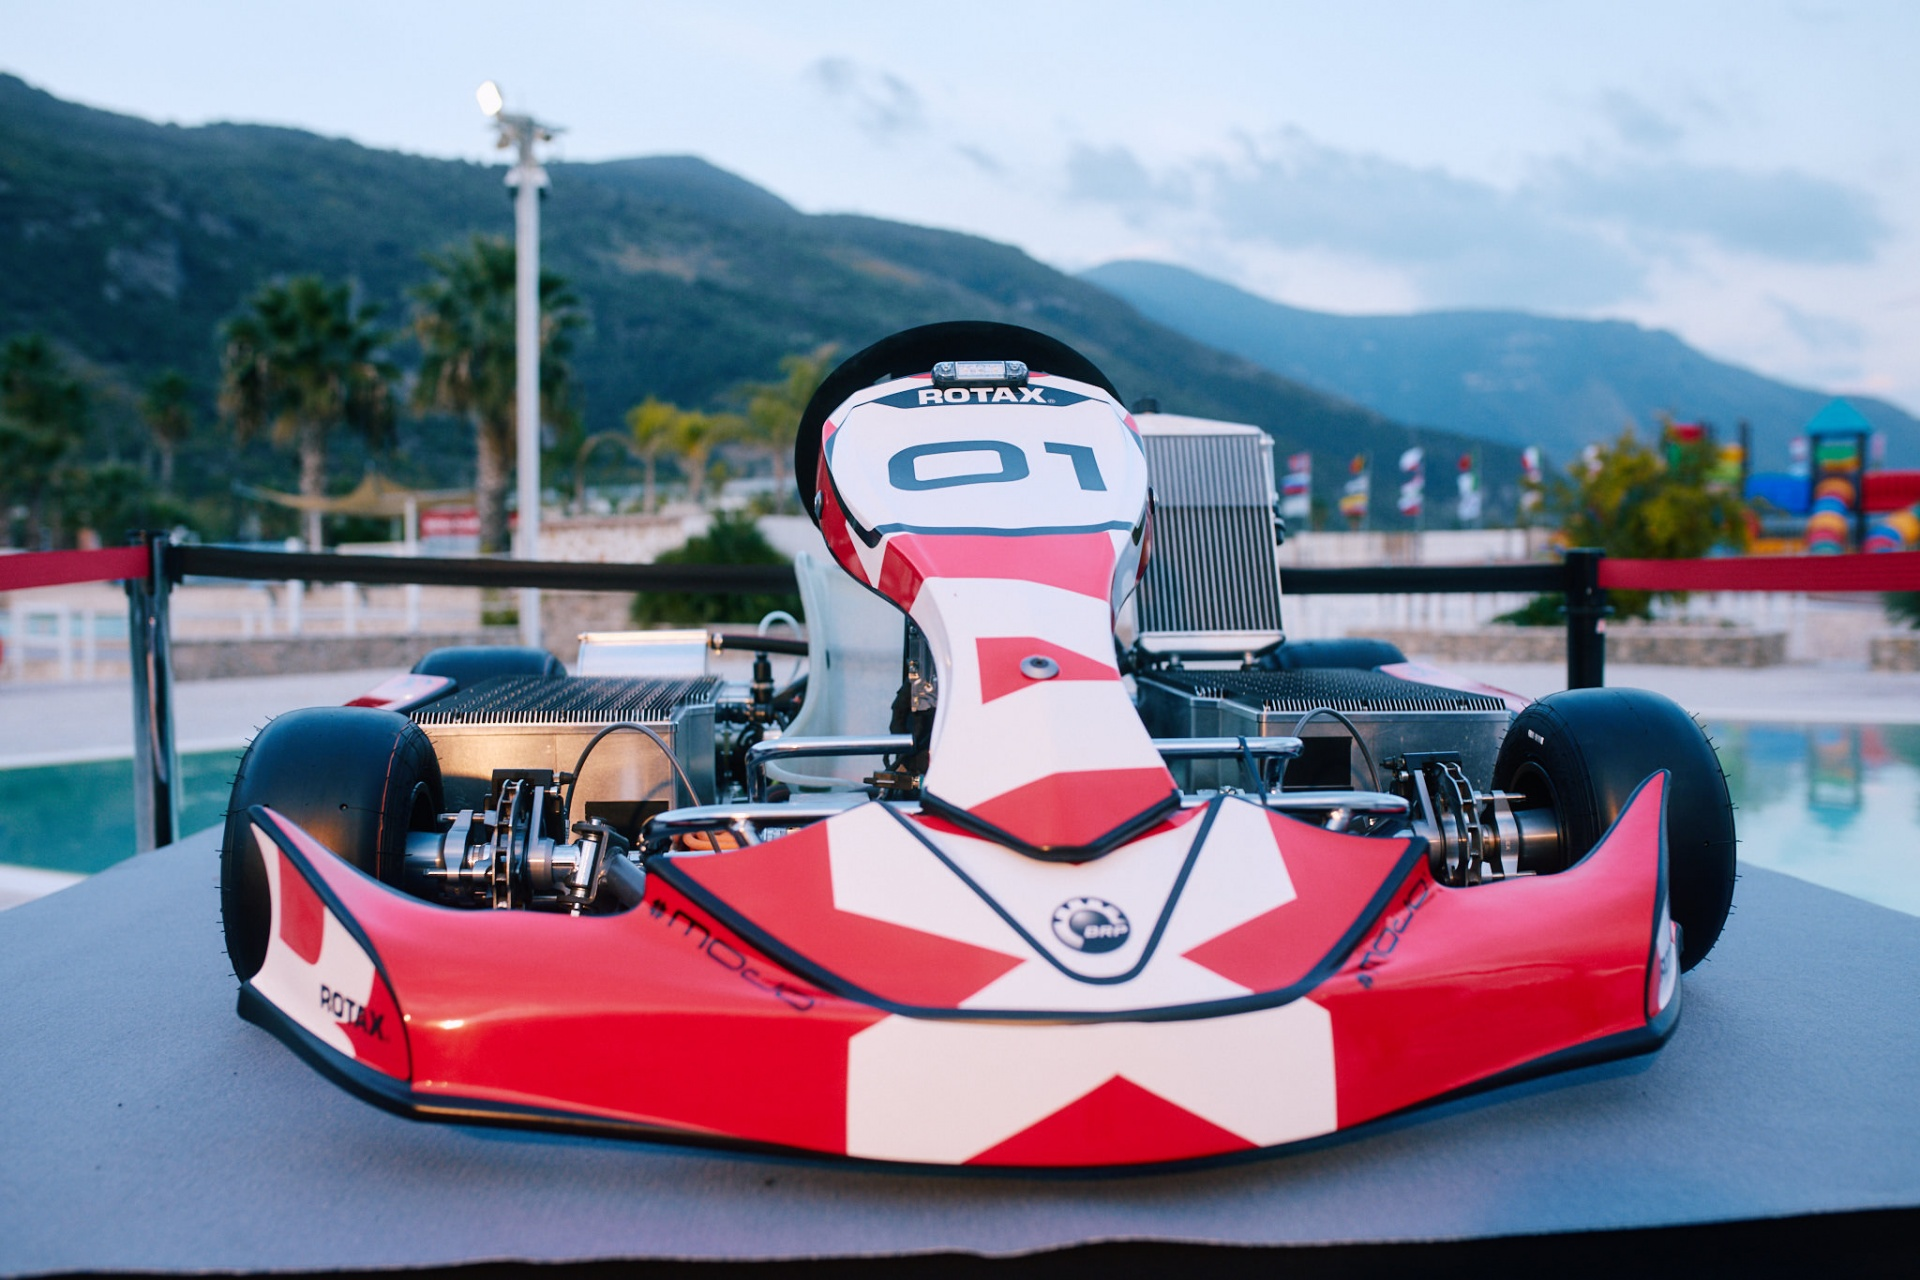 BRP-Rotax reveals new E-Kart Project E20